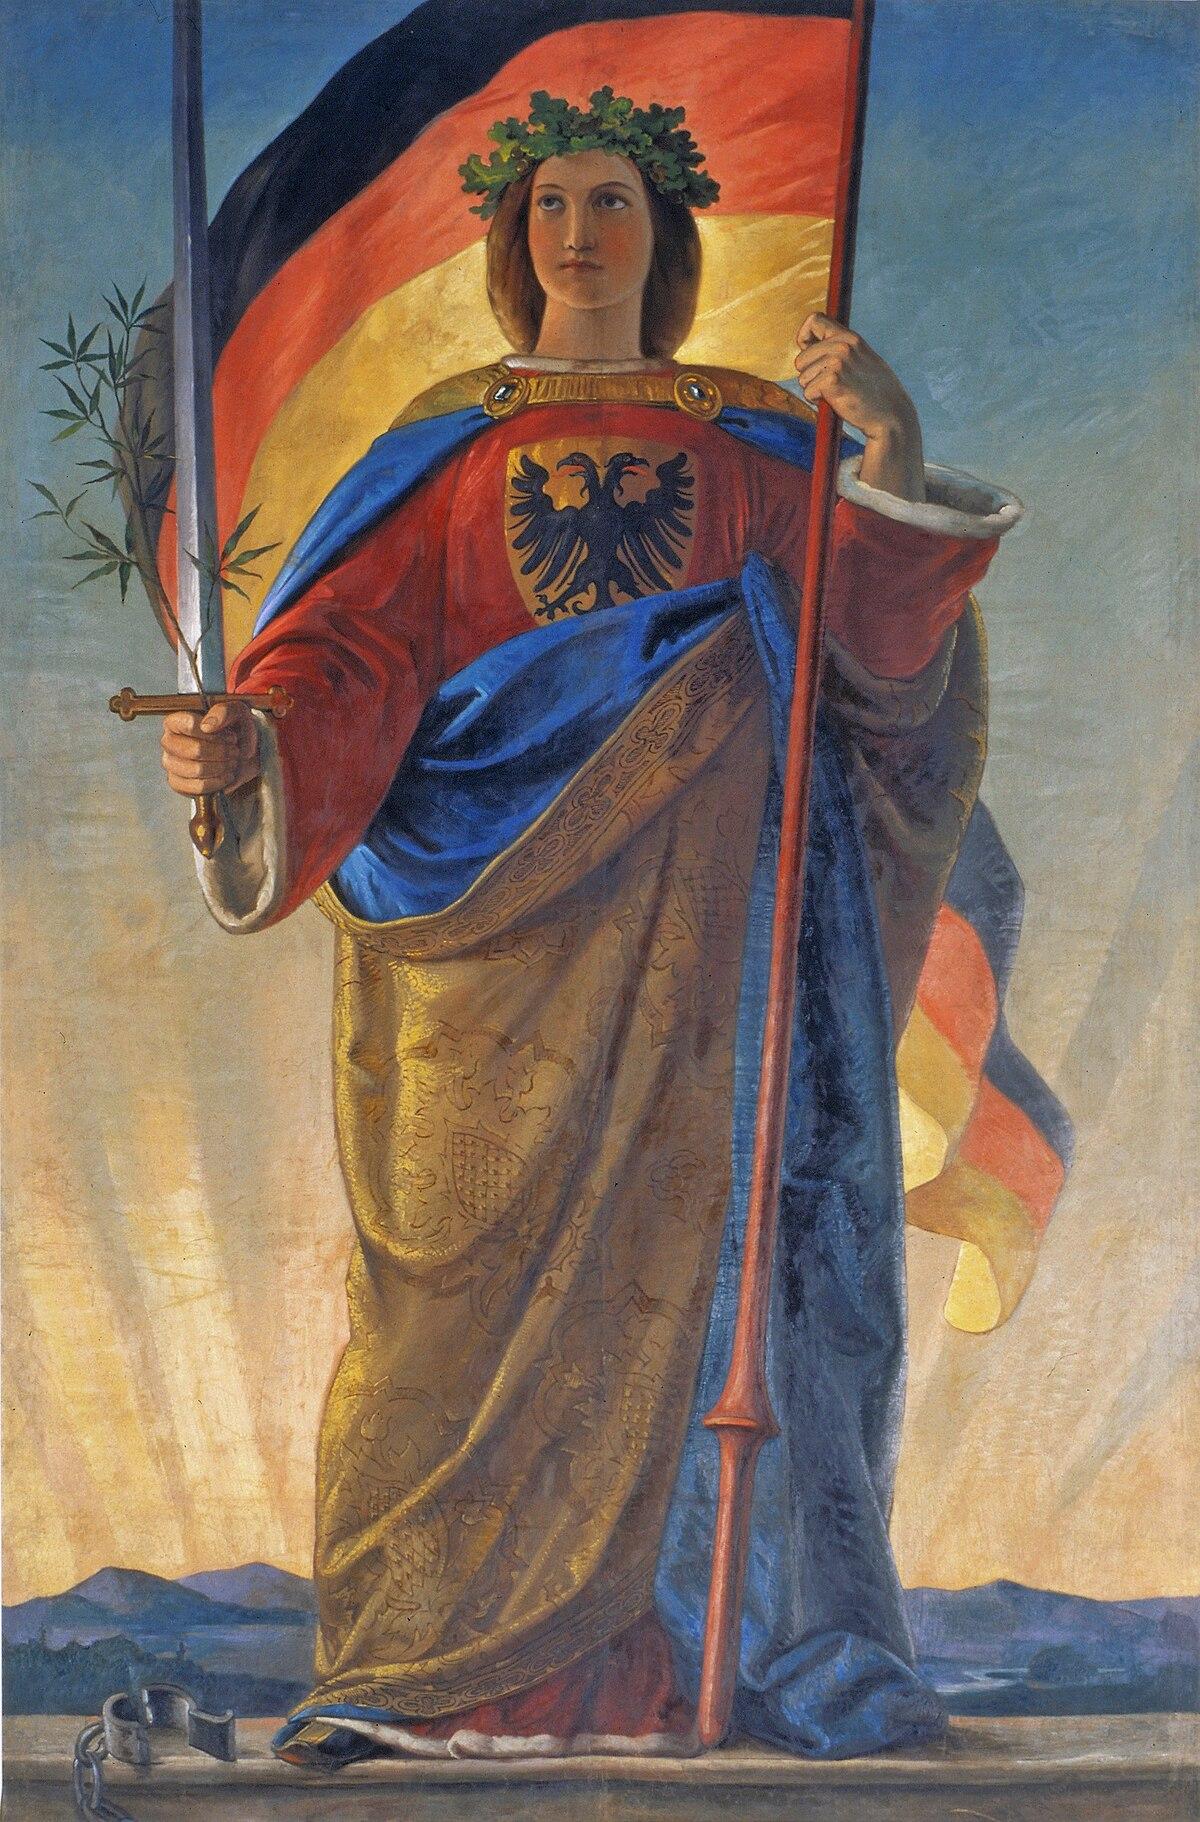 Germania (personification) - Wikipedia